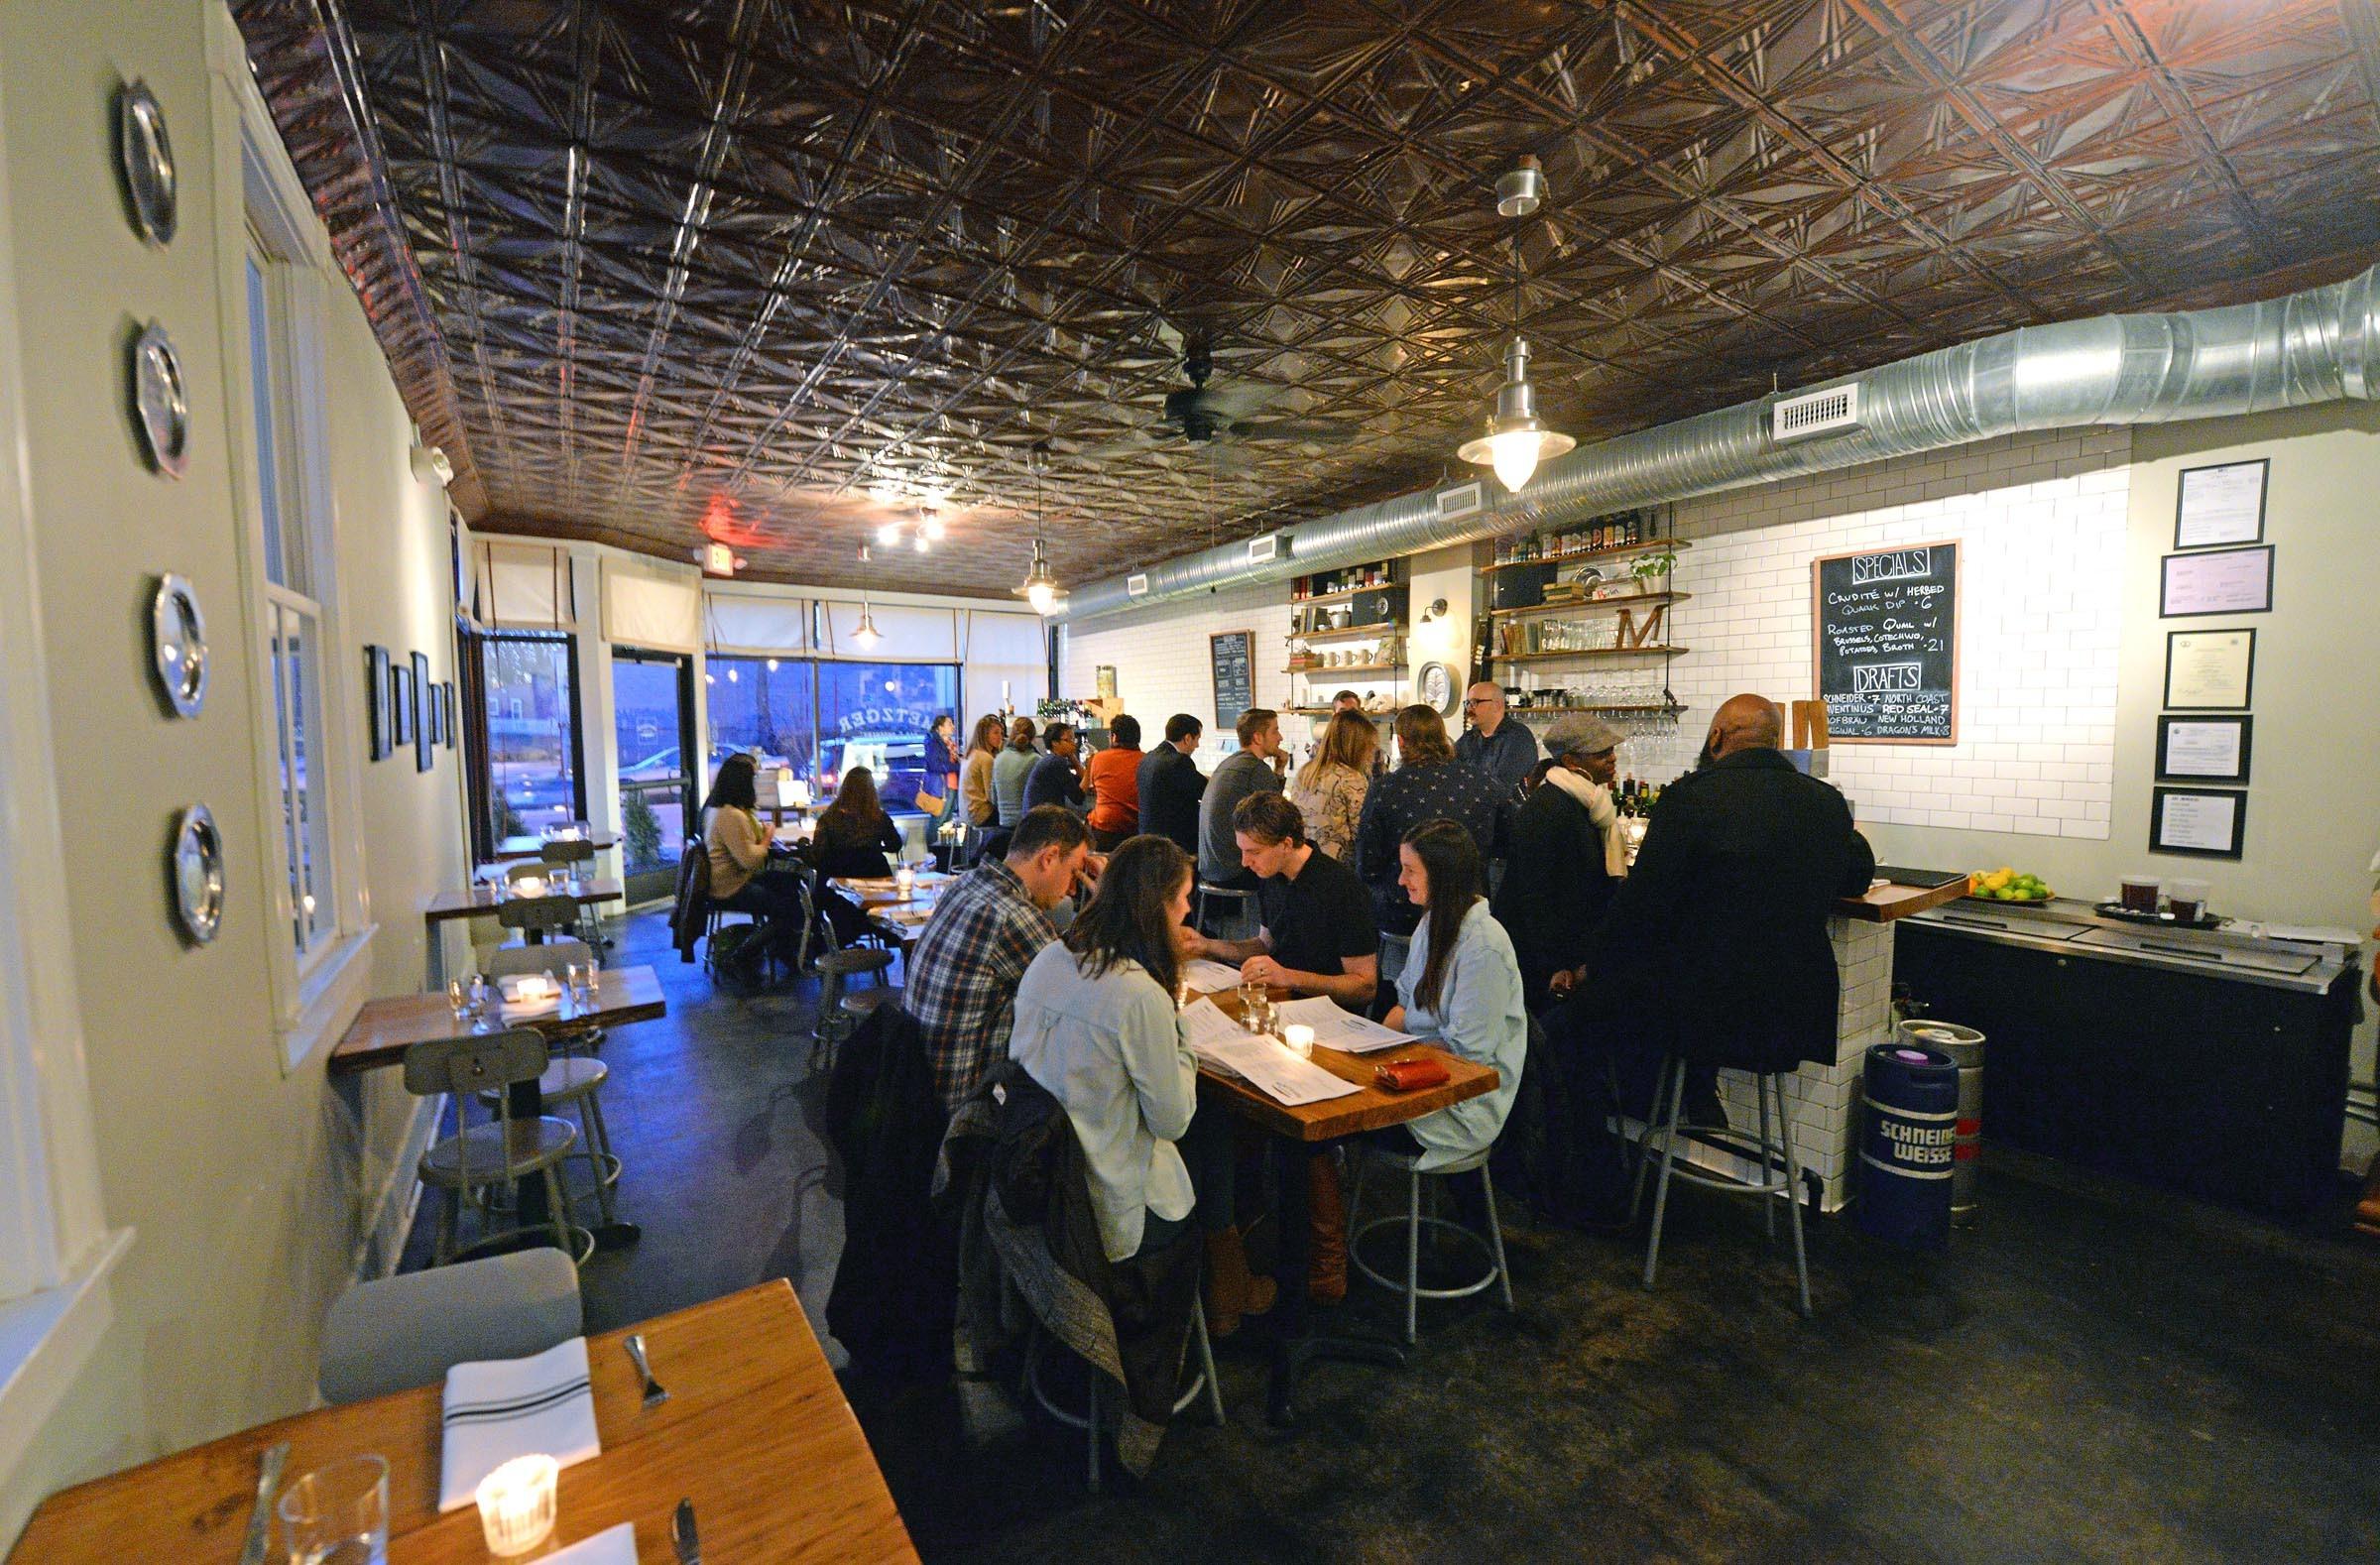 The restaurant's simple interior features white subway tile and wood floors. - SCOTT ELMQUIST